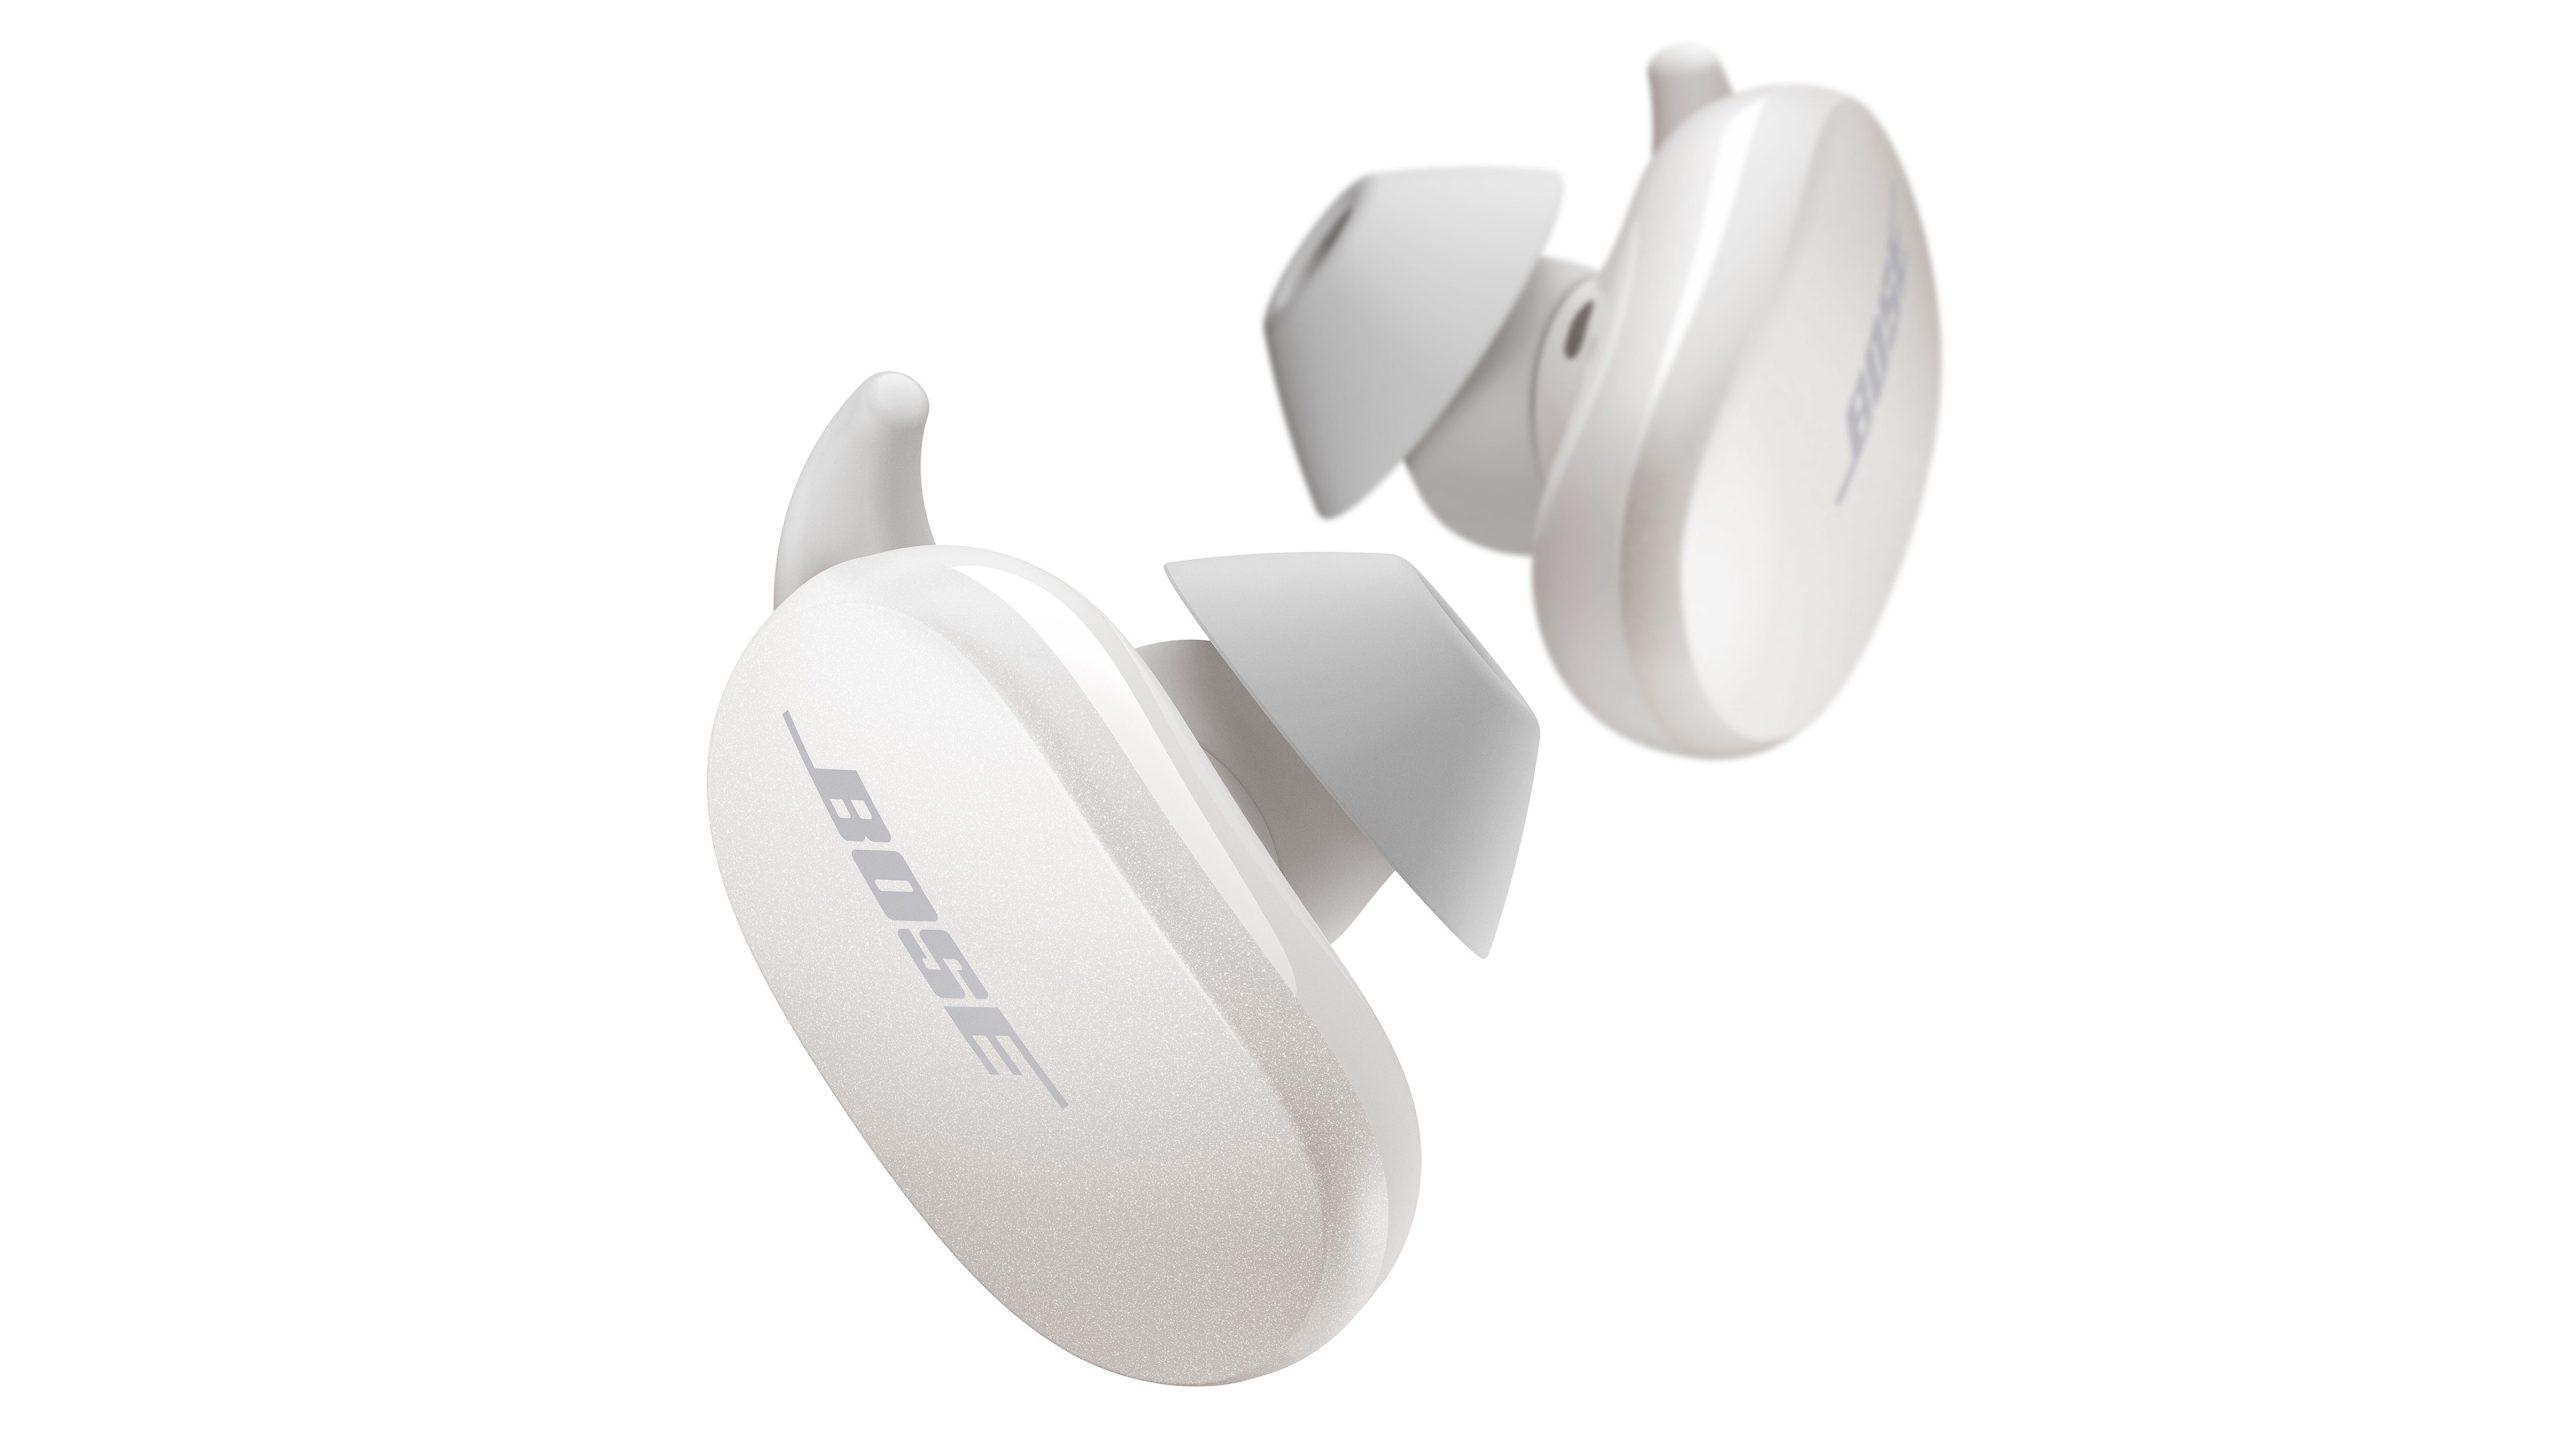 Bose QuietComfort Earbuds Soapstone (1)